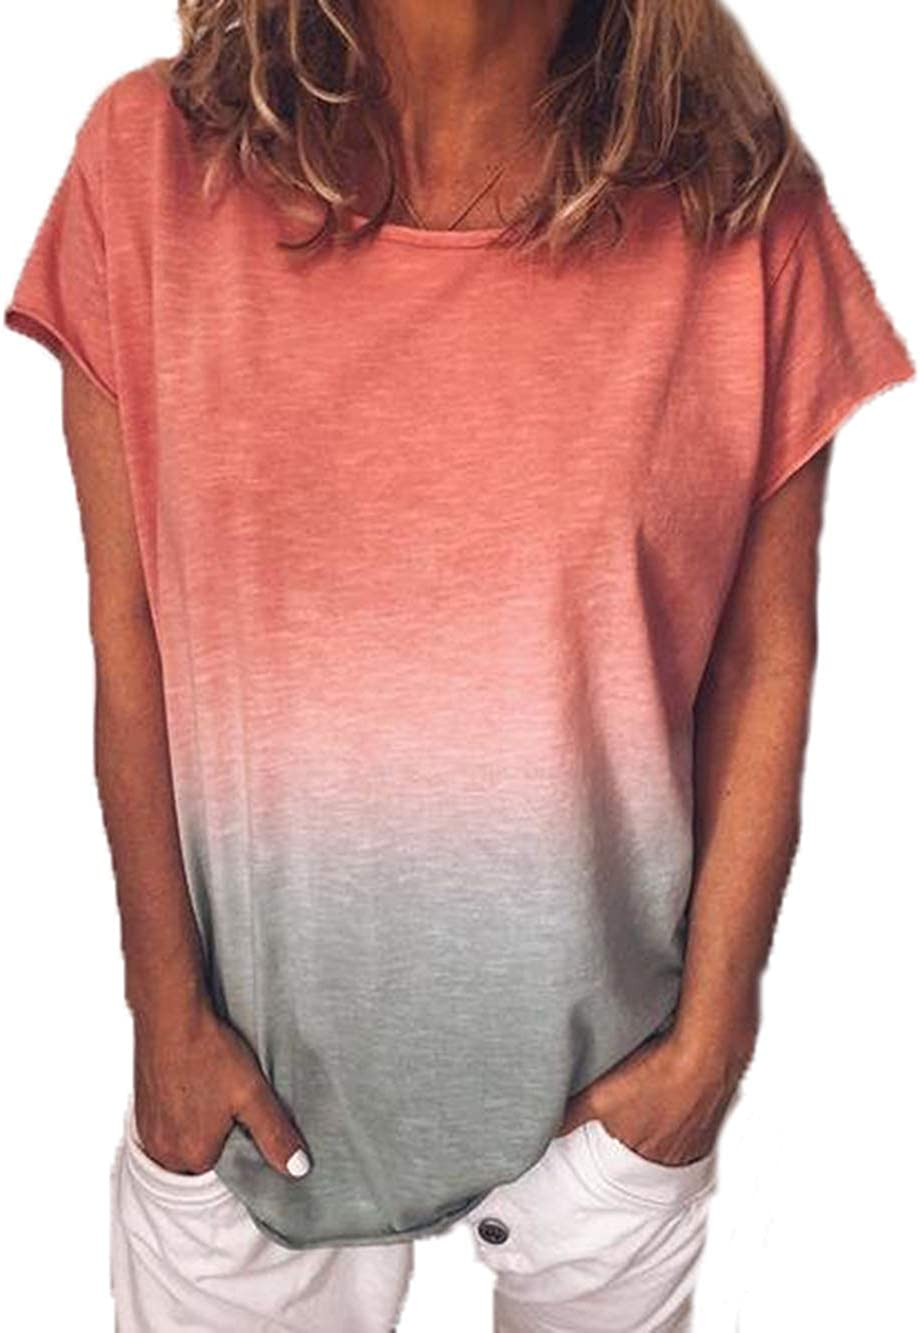 Yutila Damen Kurzarm T-Shirt Beil/äufig Farbverlauf Shirt Sommer Lose Shirt Tees